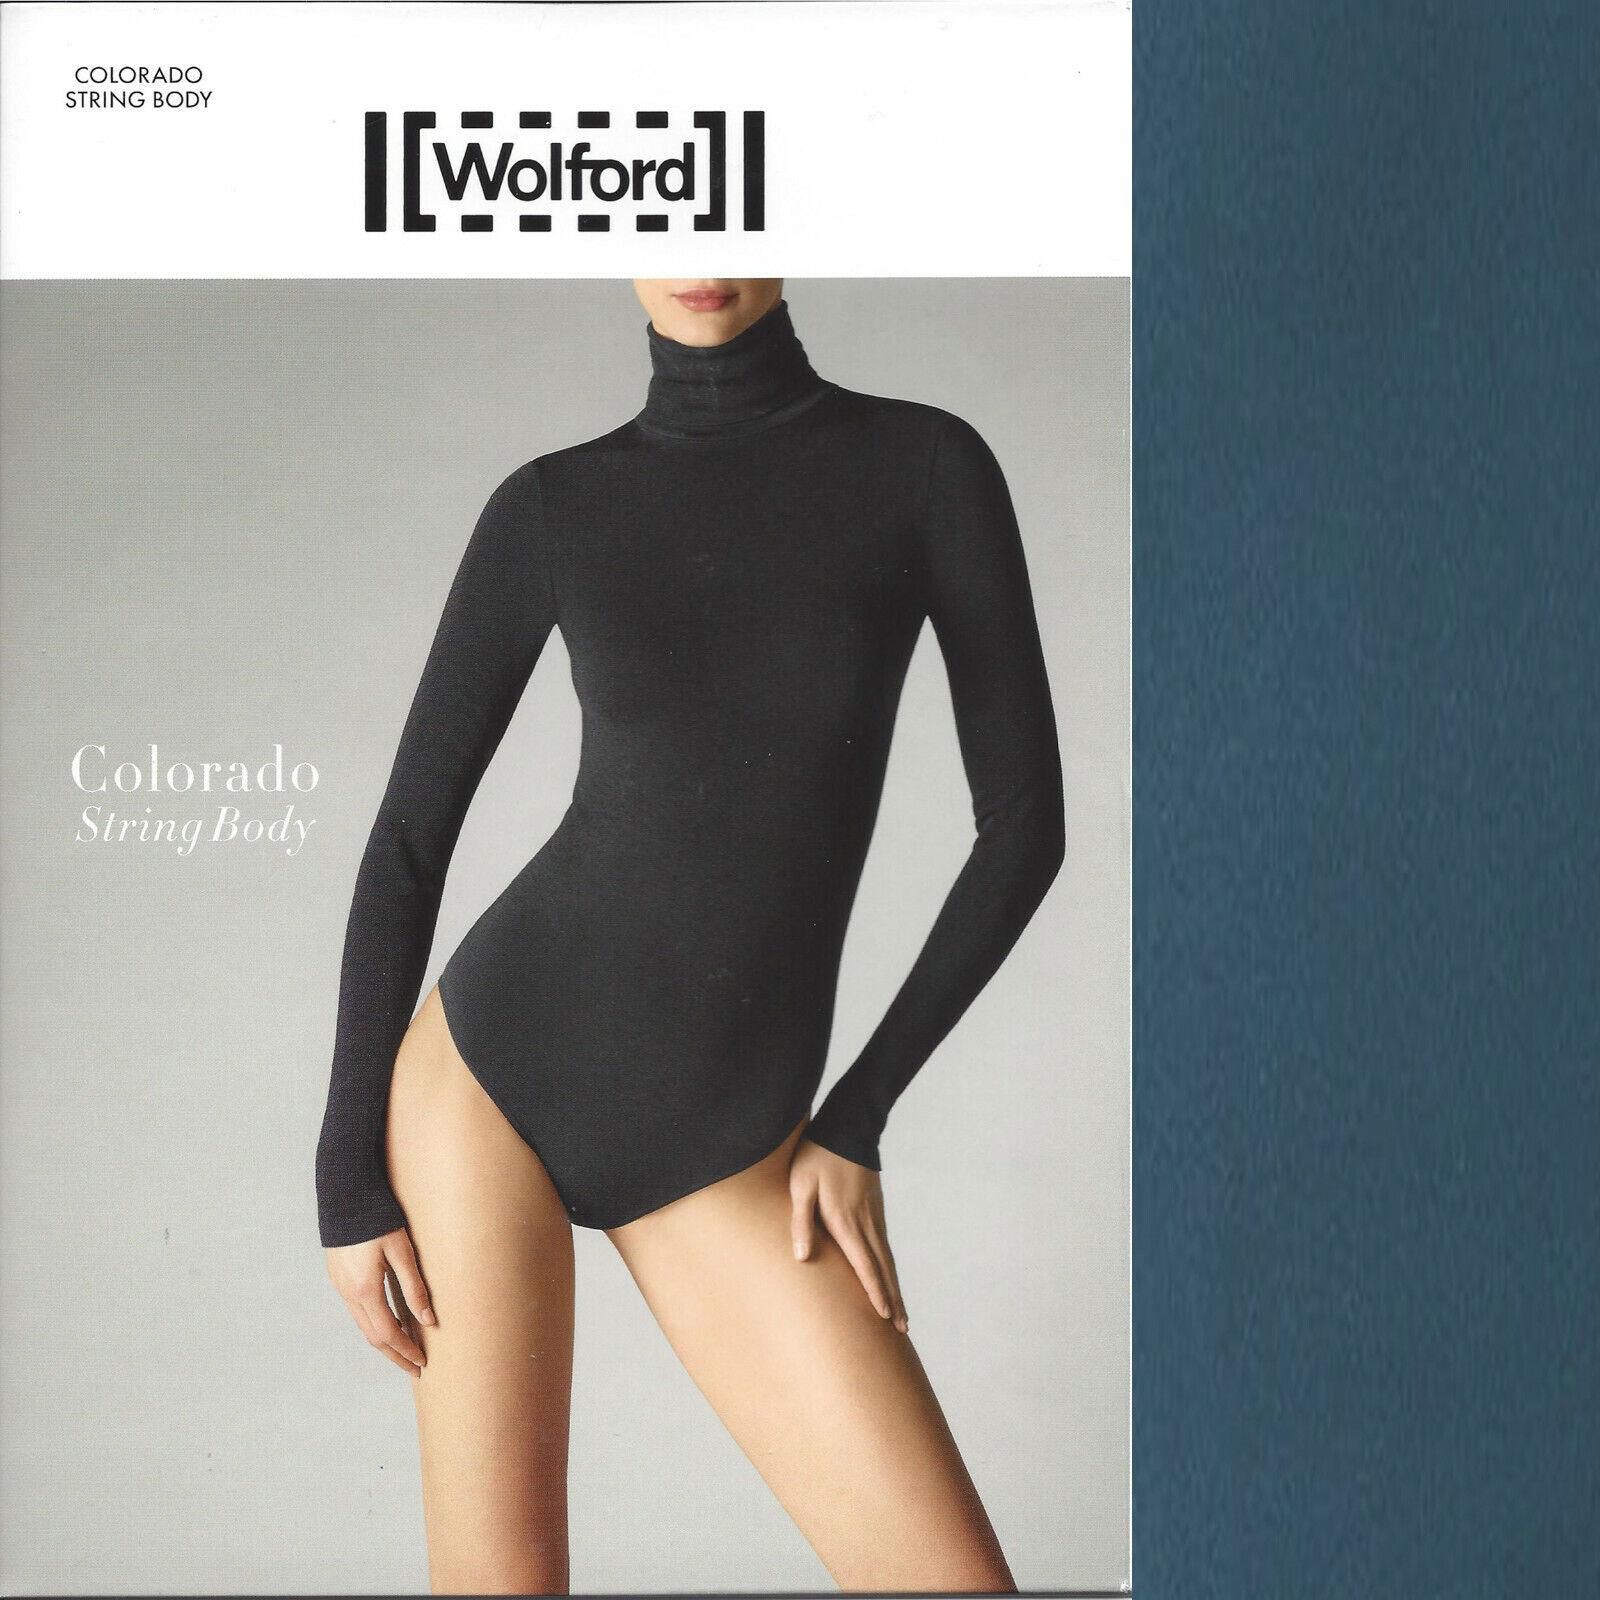 Wolford Farbeado String Body • M • iron Blau  ... nahtlos anschmiegsam